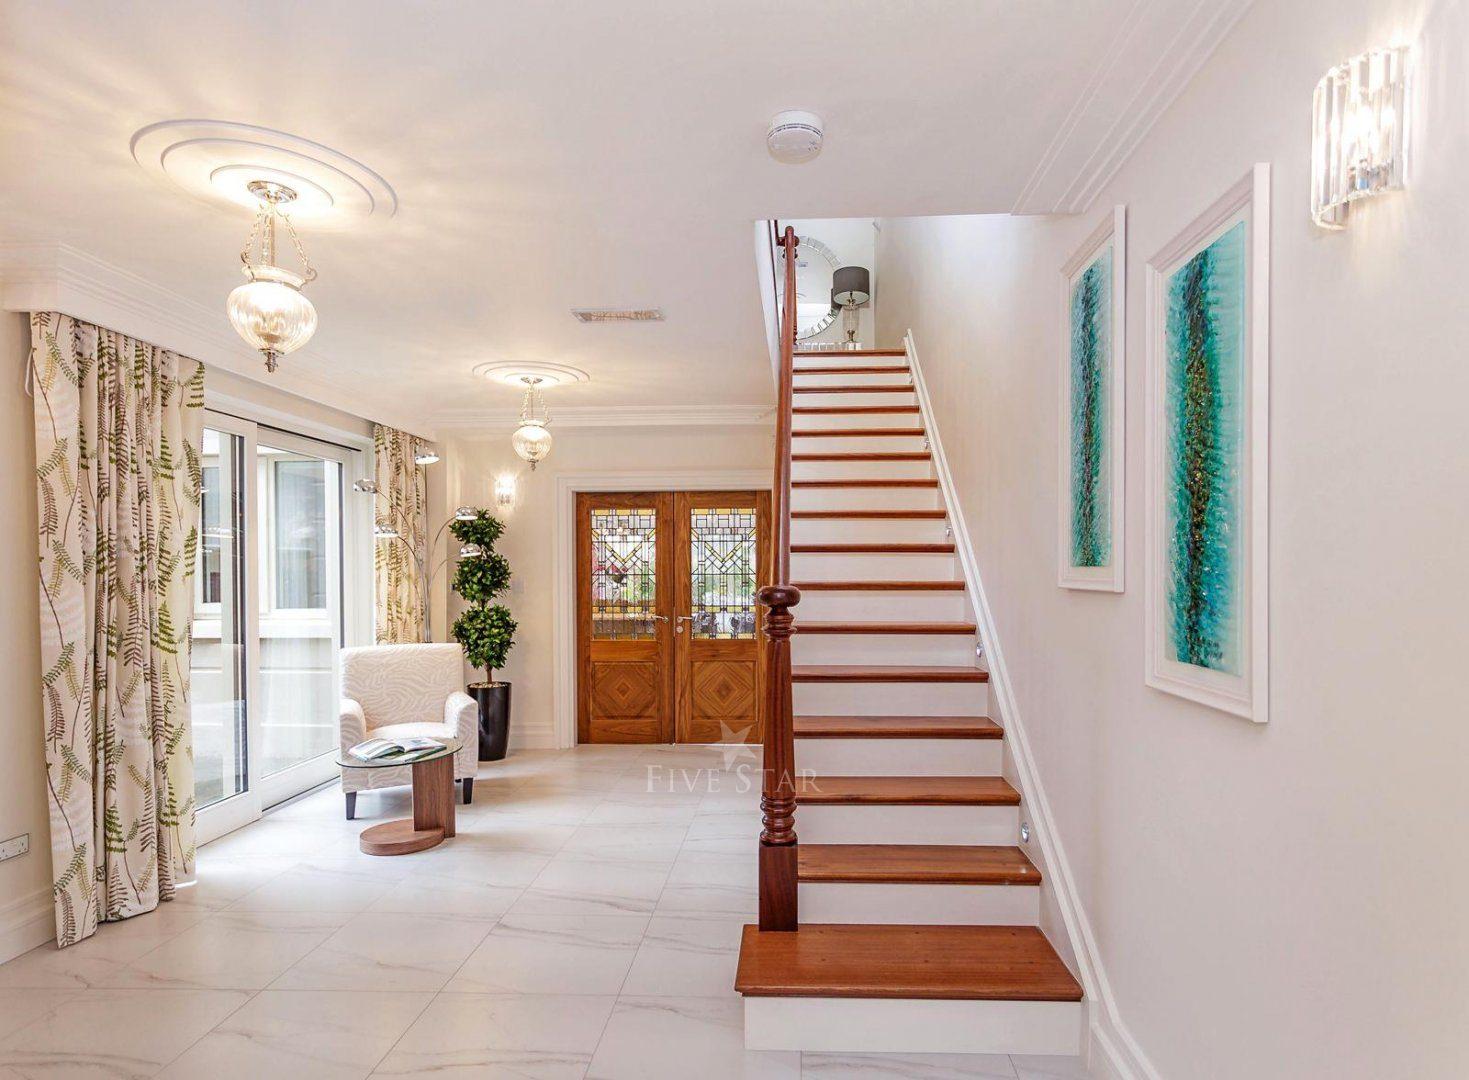 5-Star Killarney Residence photo 6